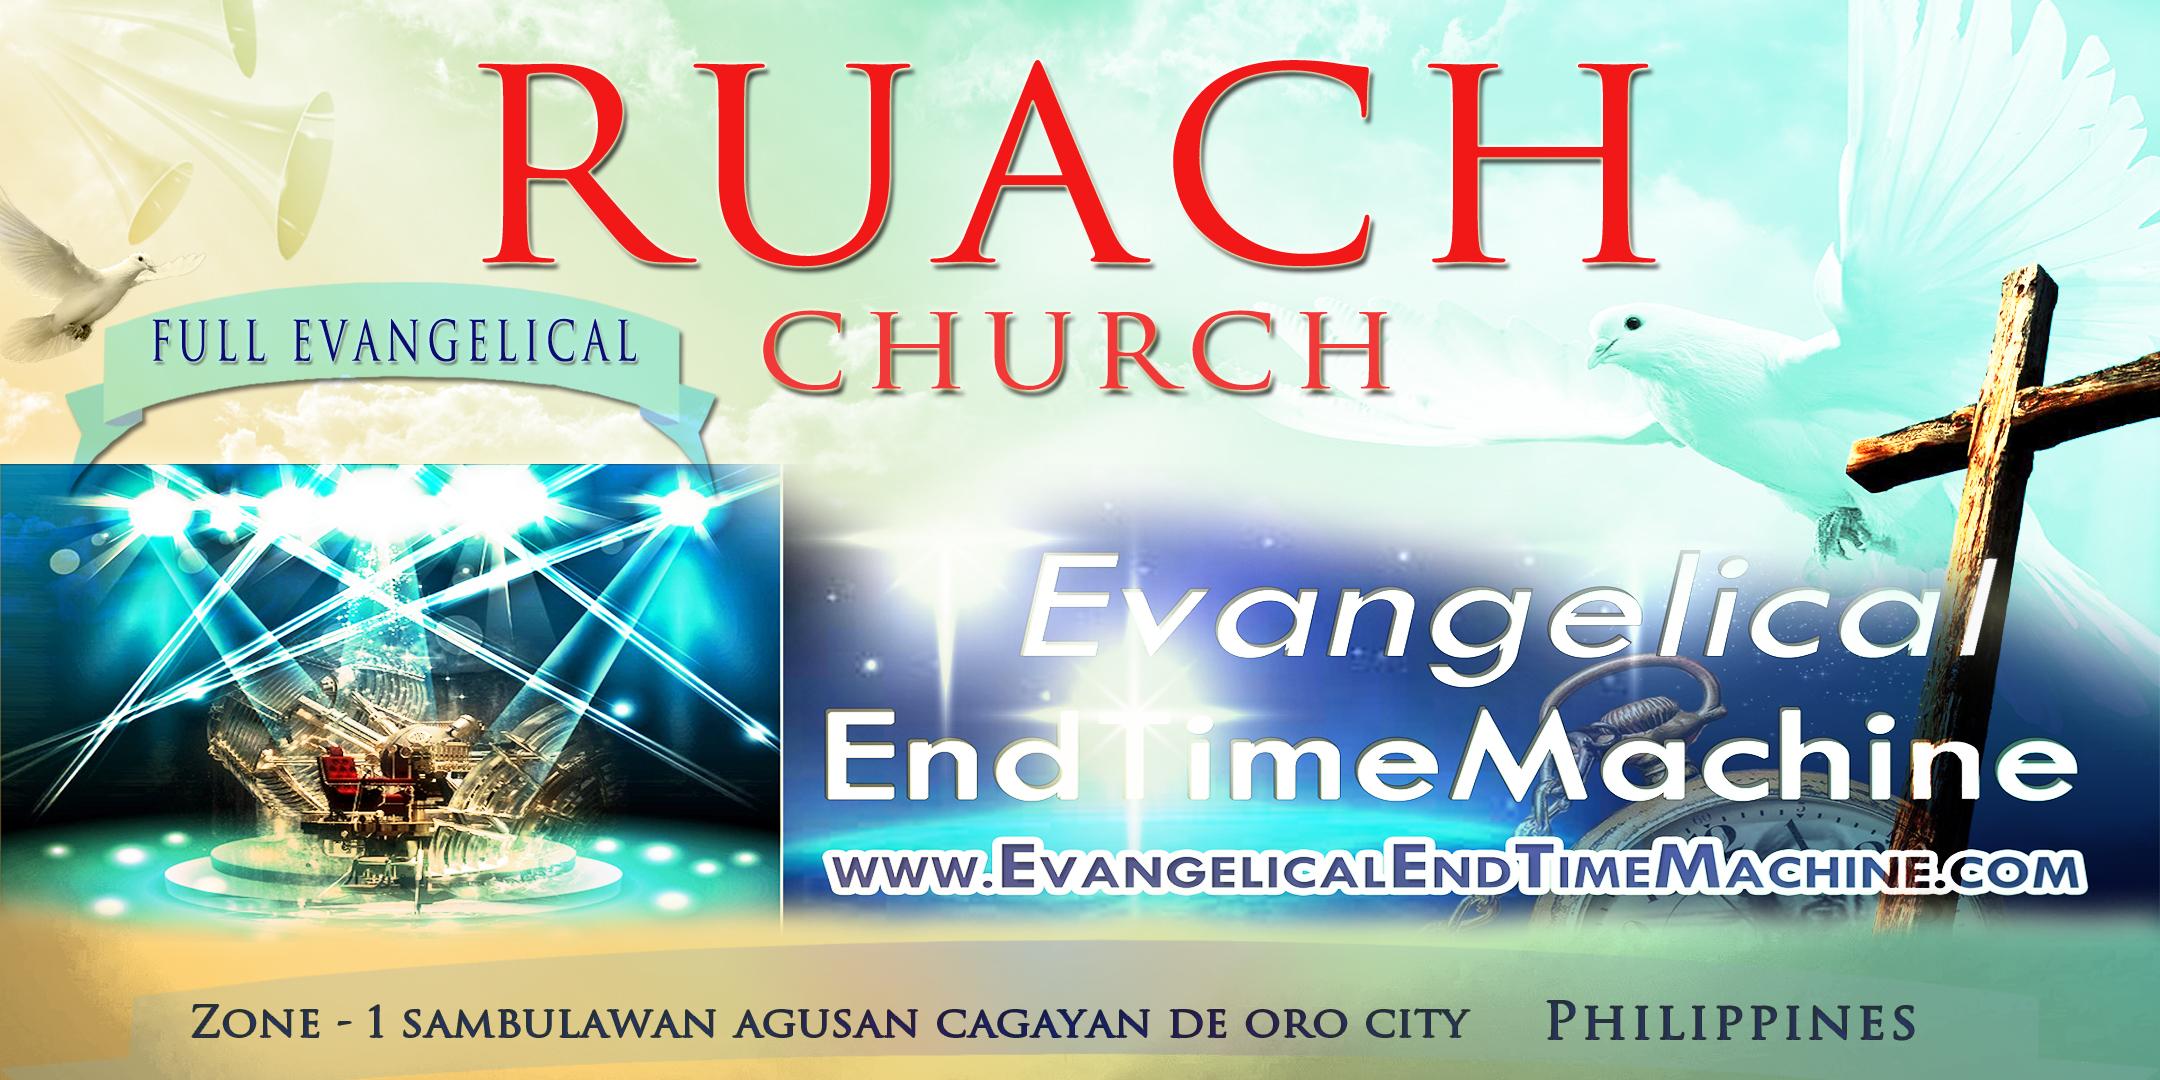 church-ruach-banner-philippines